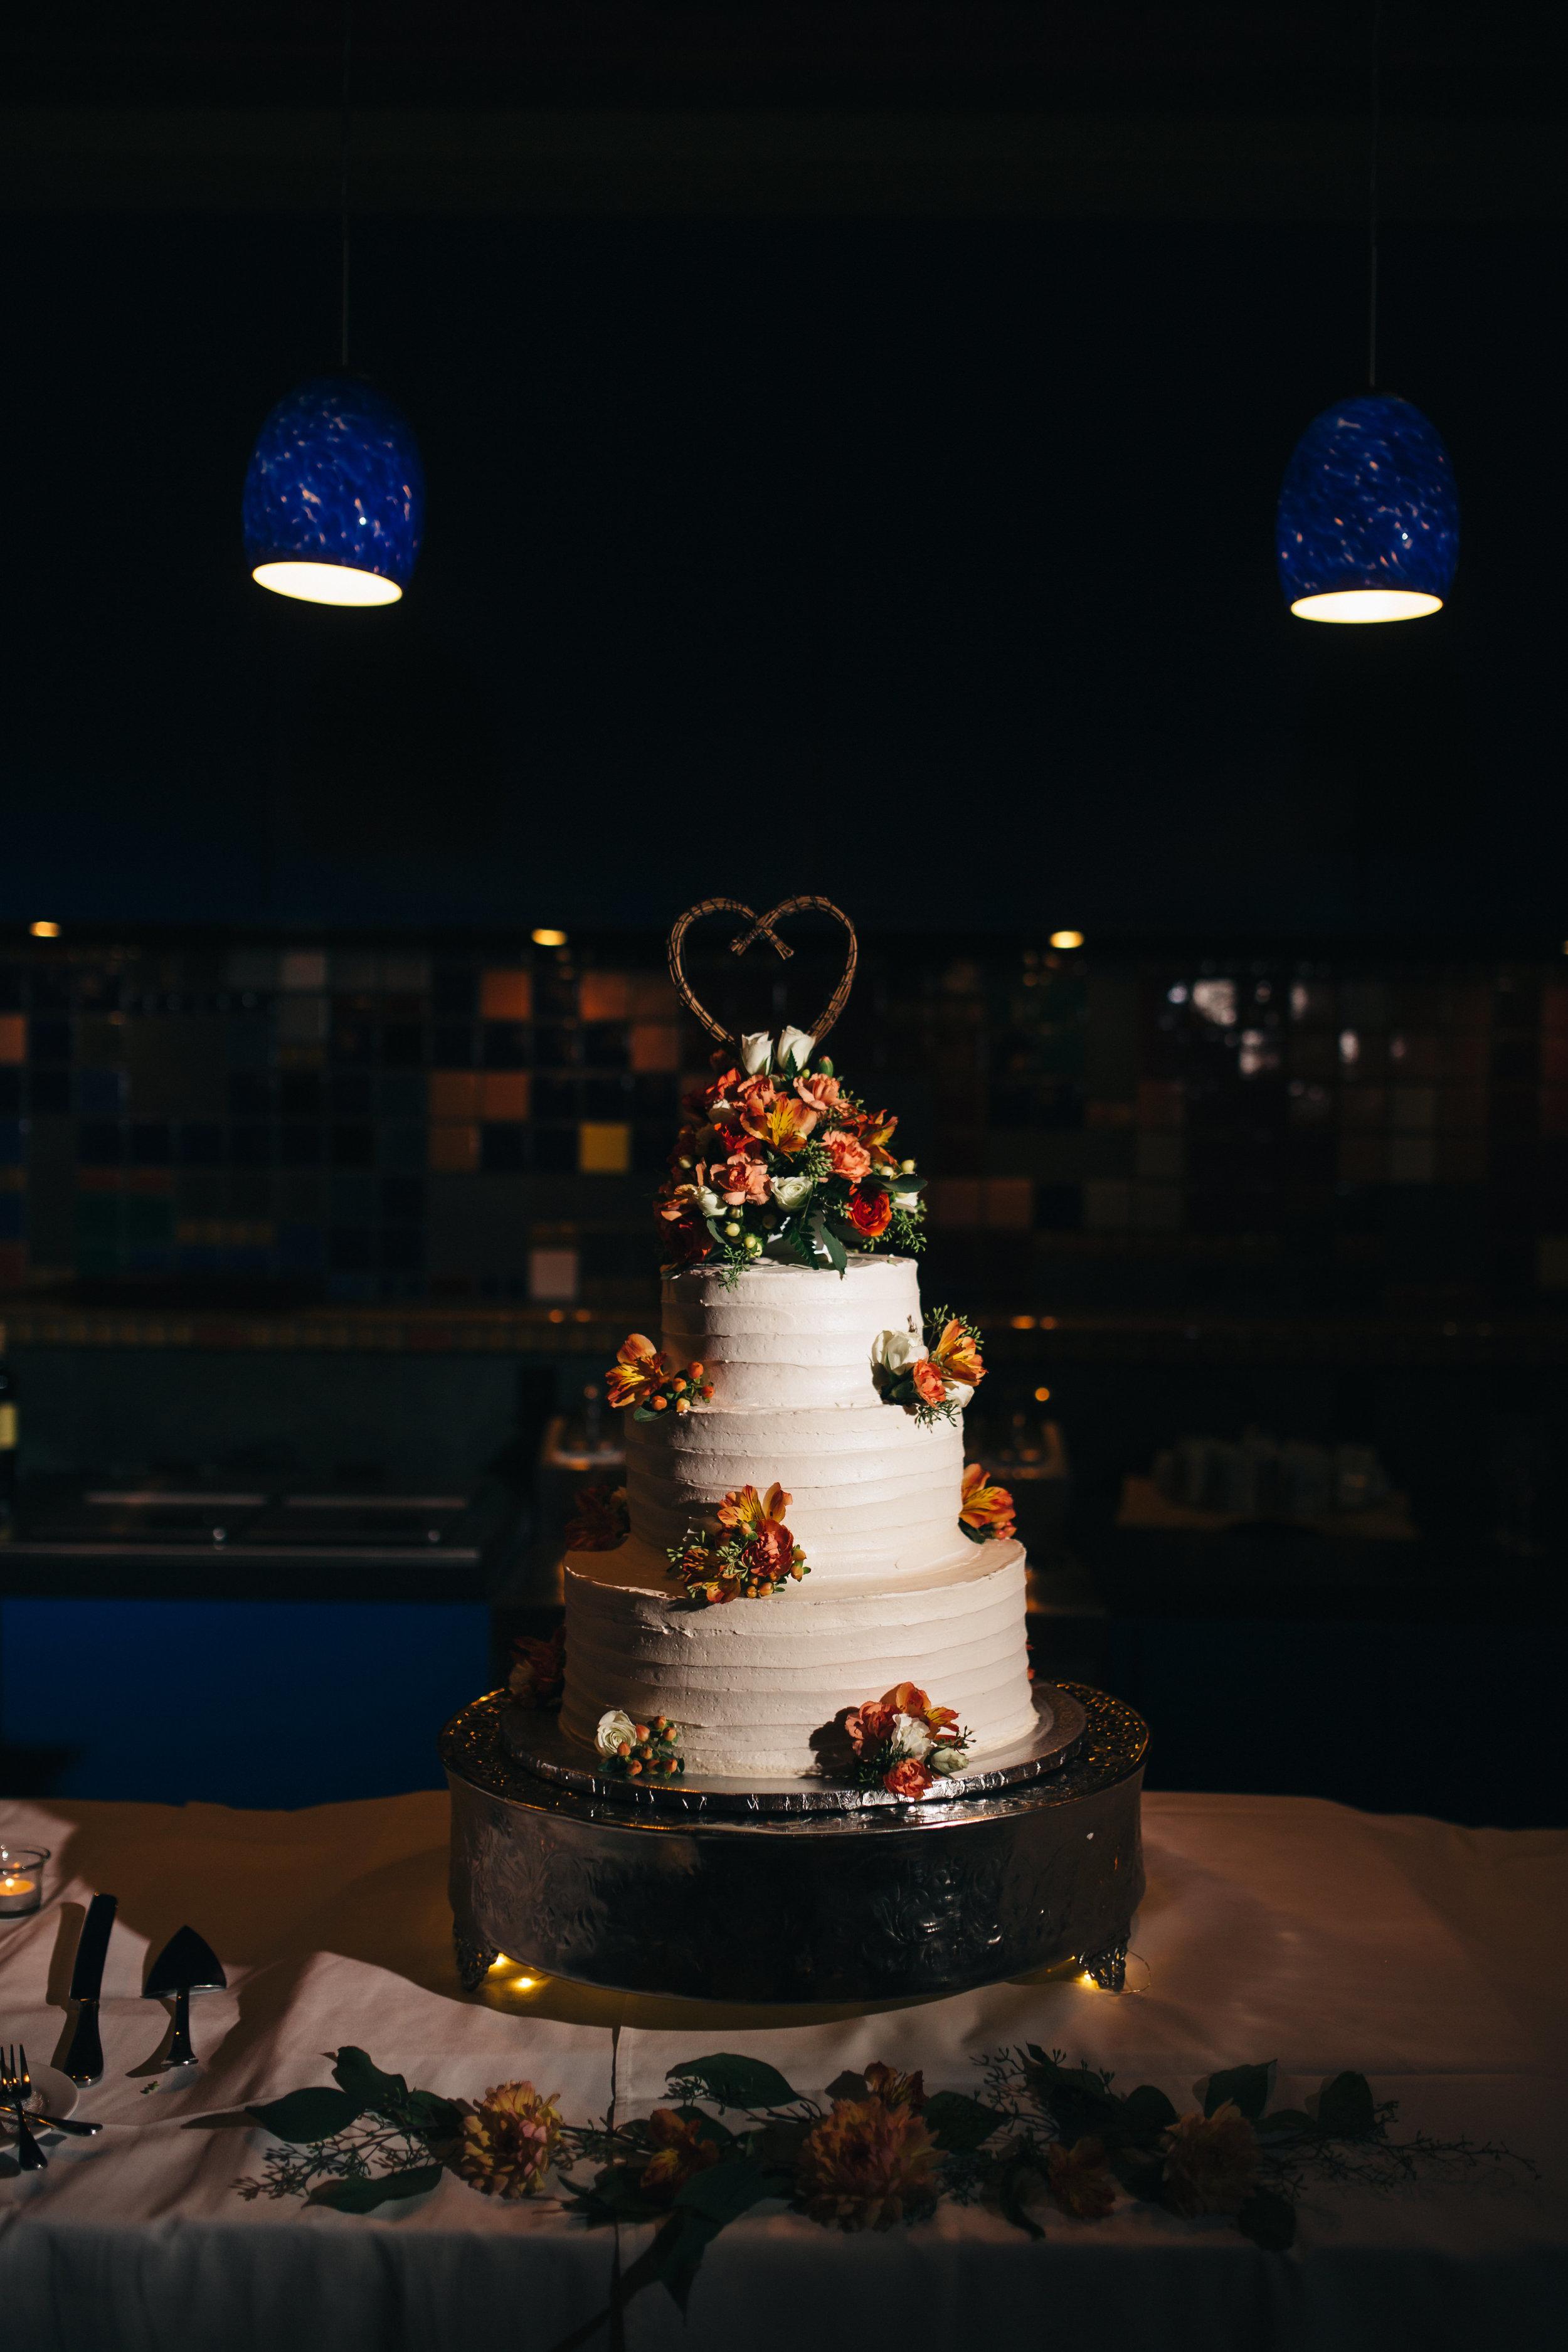 Wedding cake at Walden Inn & Spa Wedding